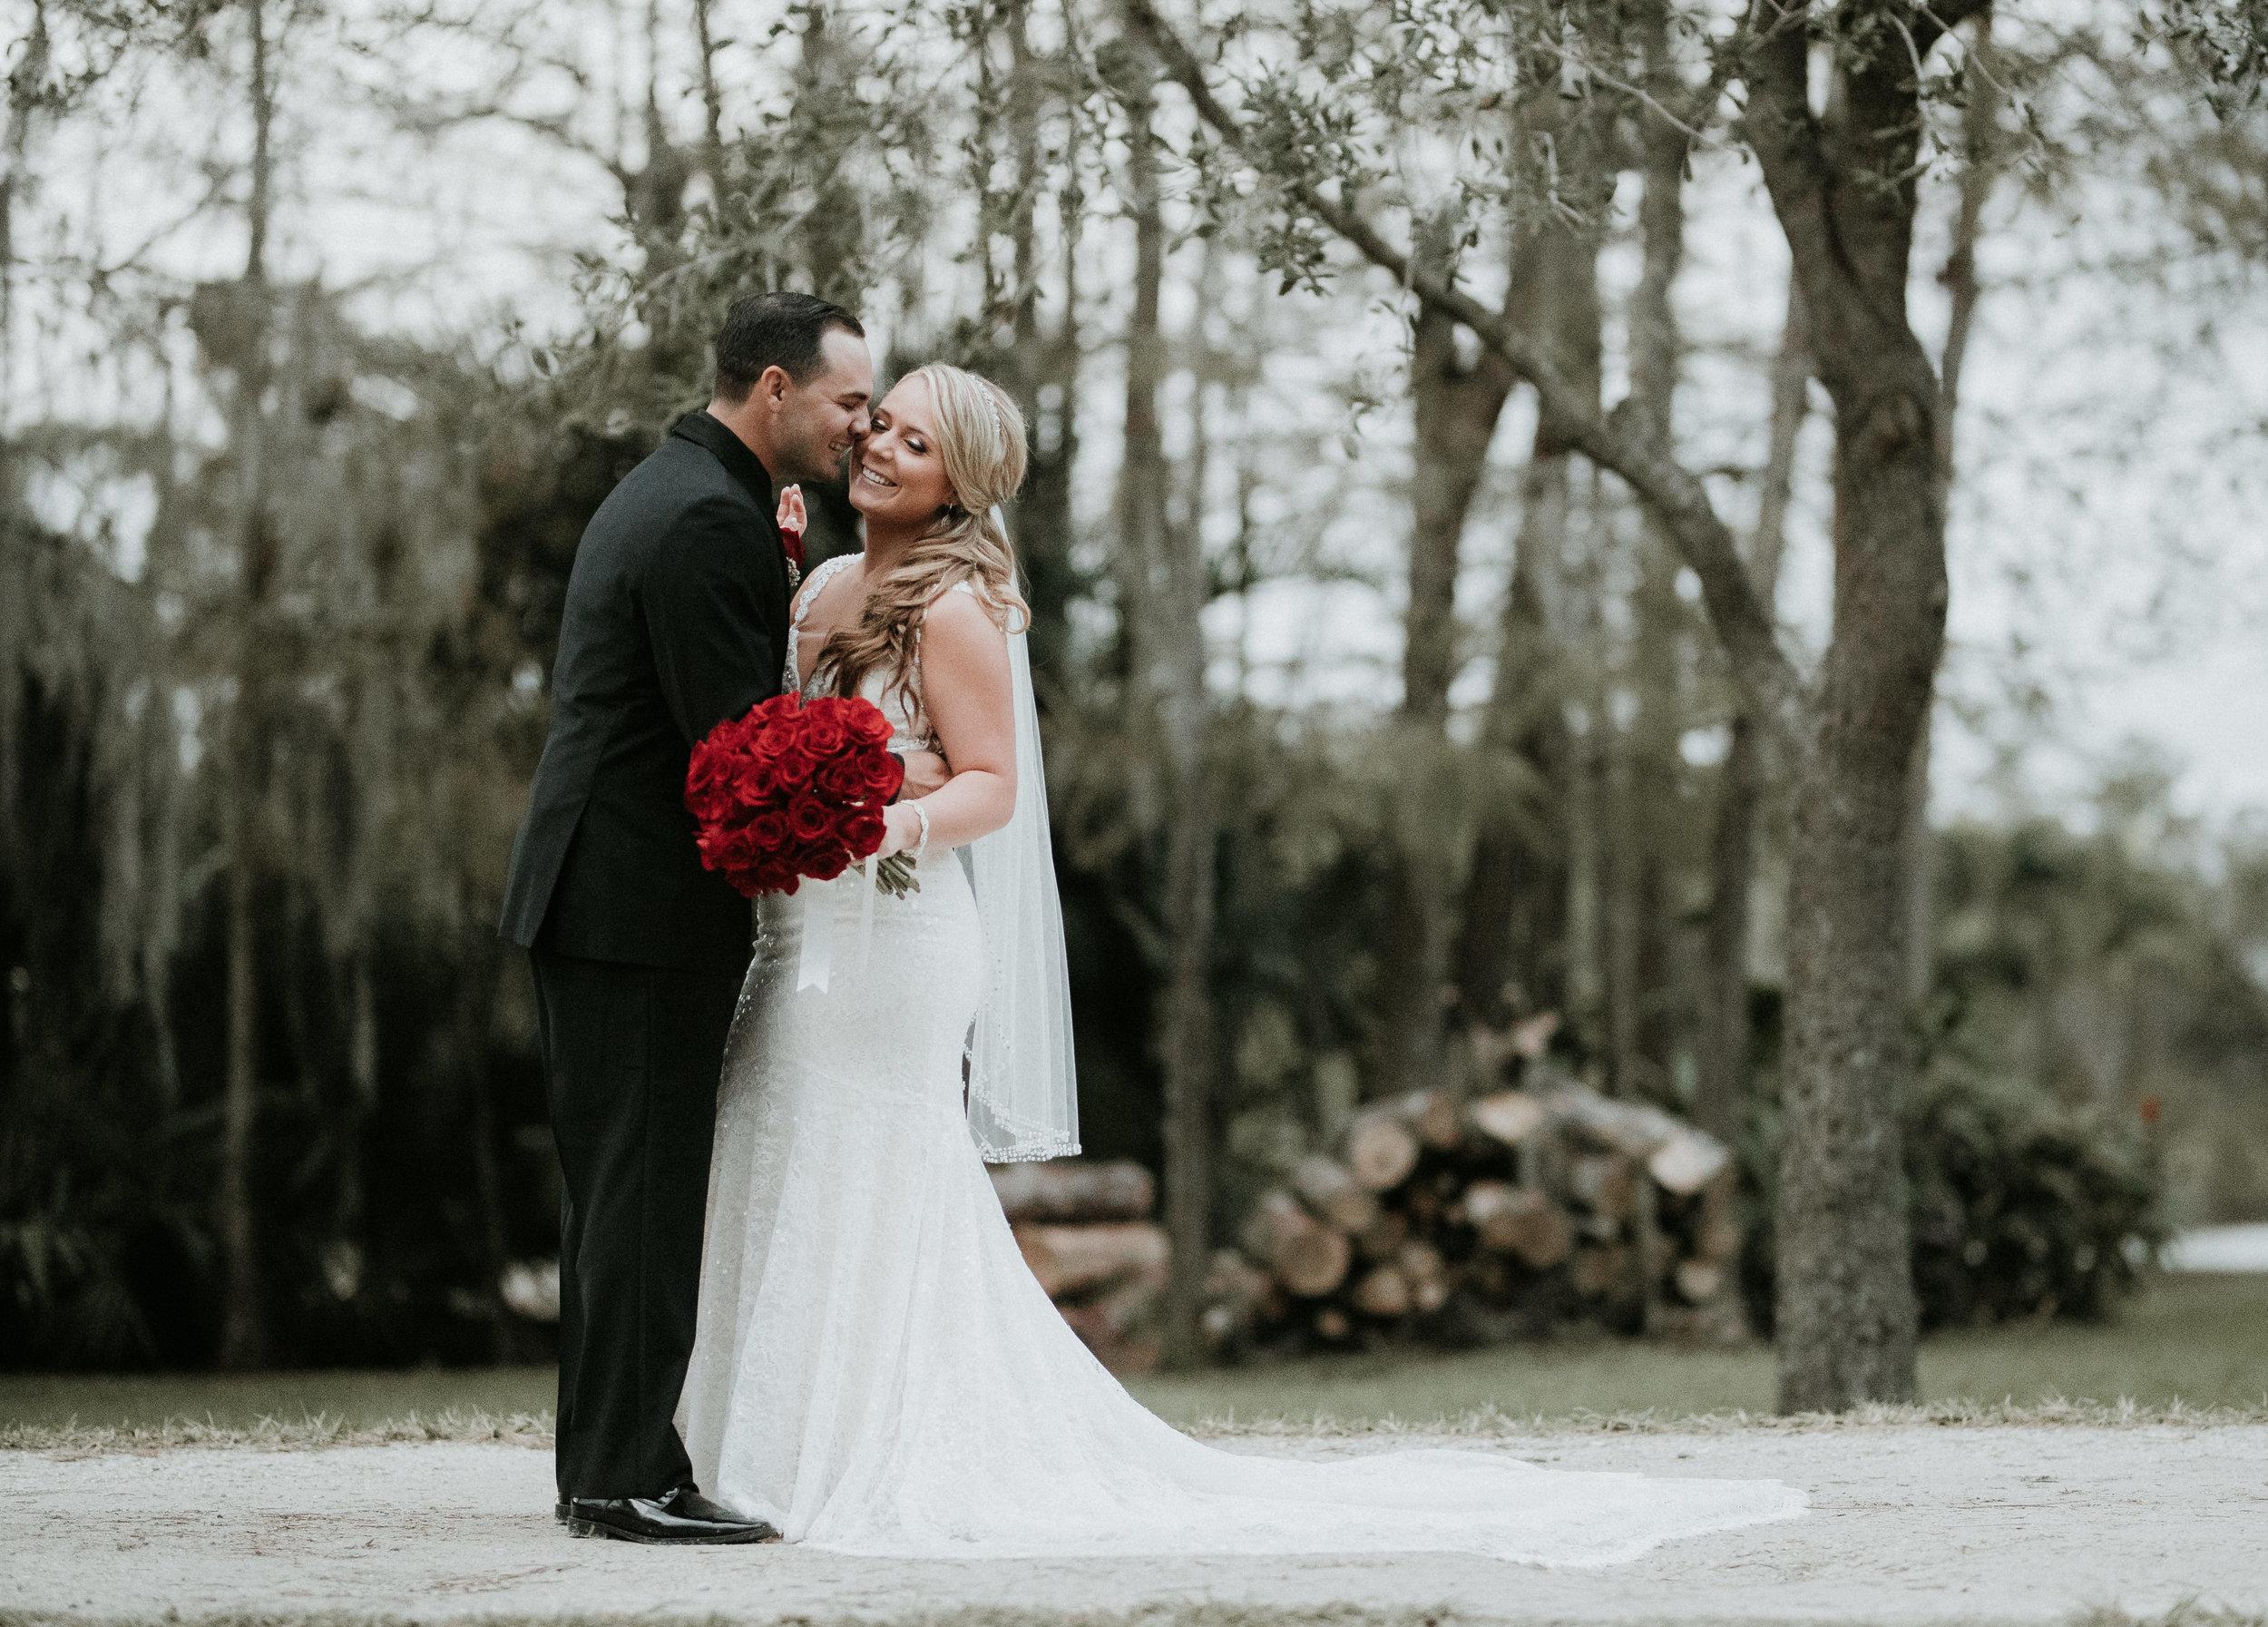 Lexi & Joey's Wedding | Highlights-0069.jpg